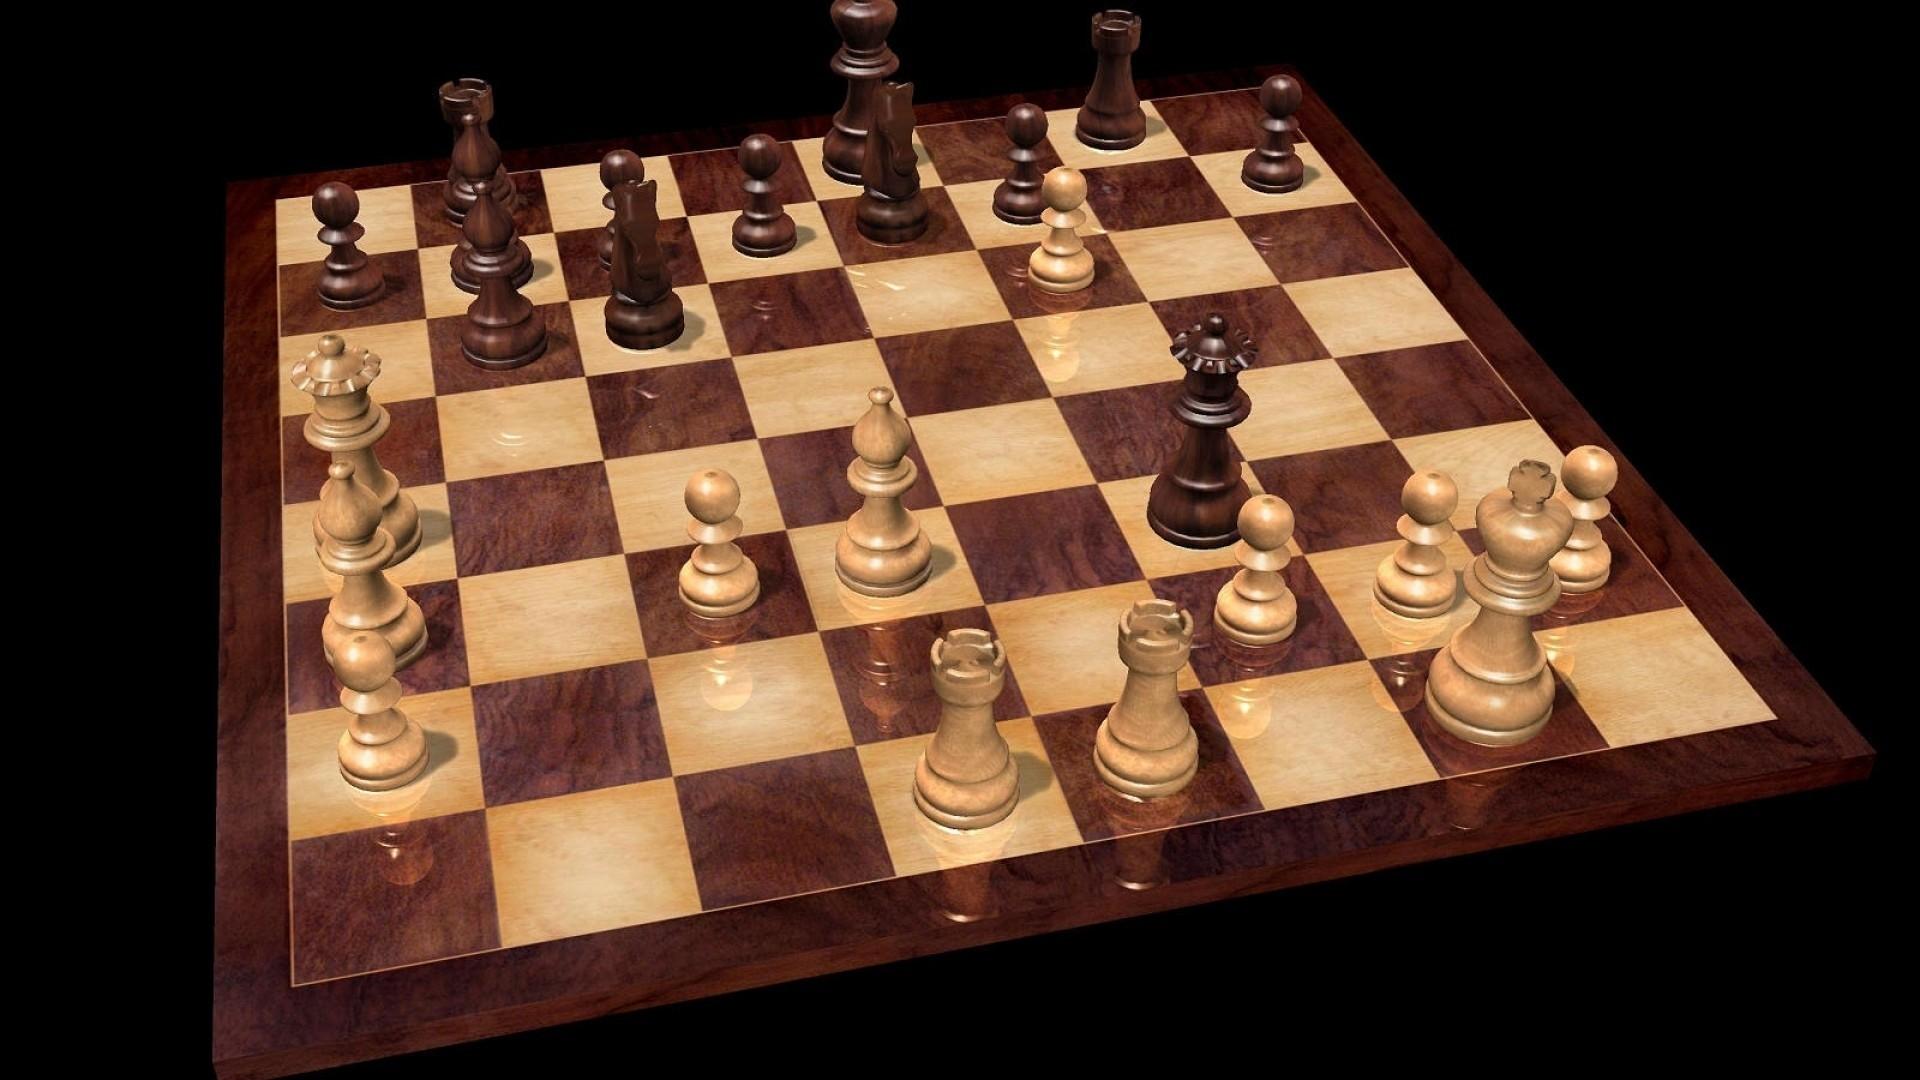 Chess hd wallpaper download